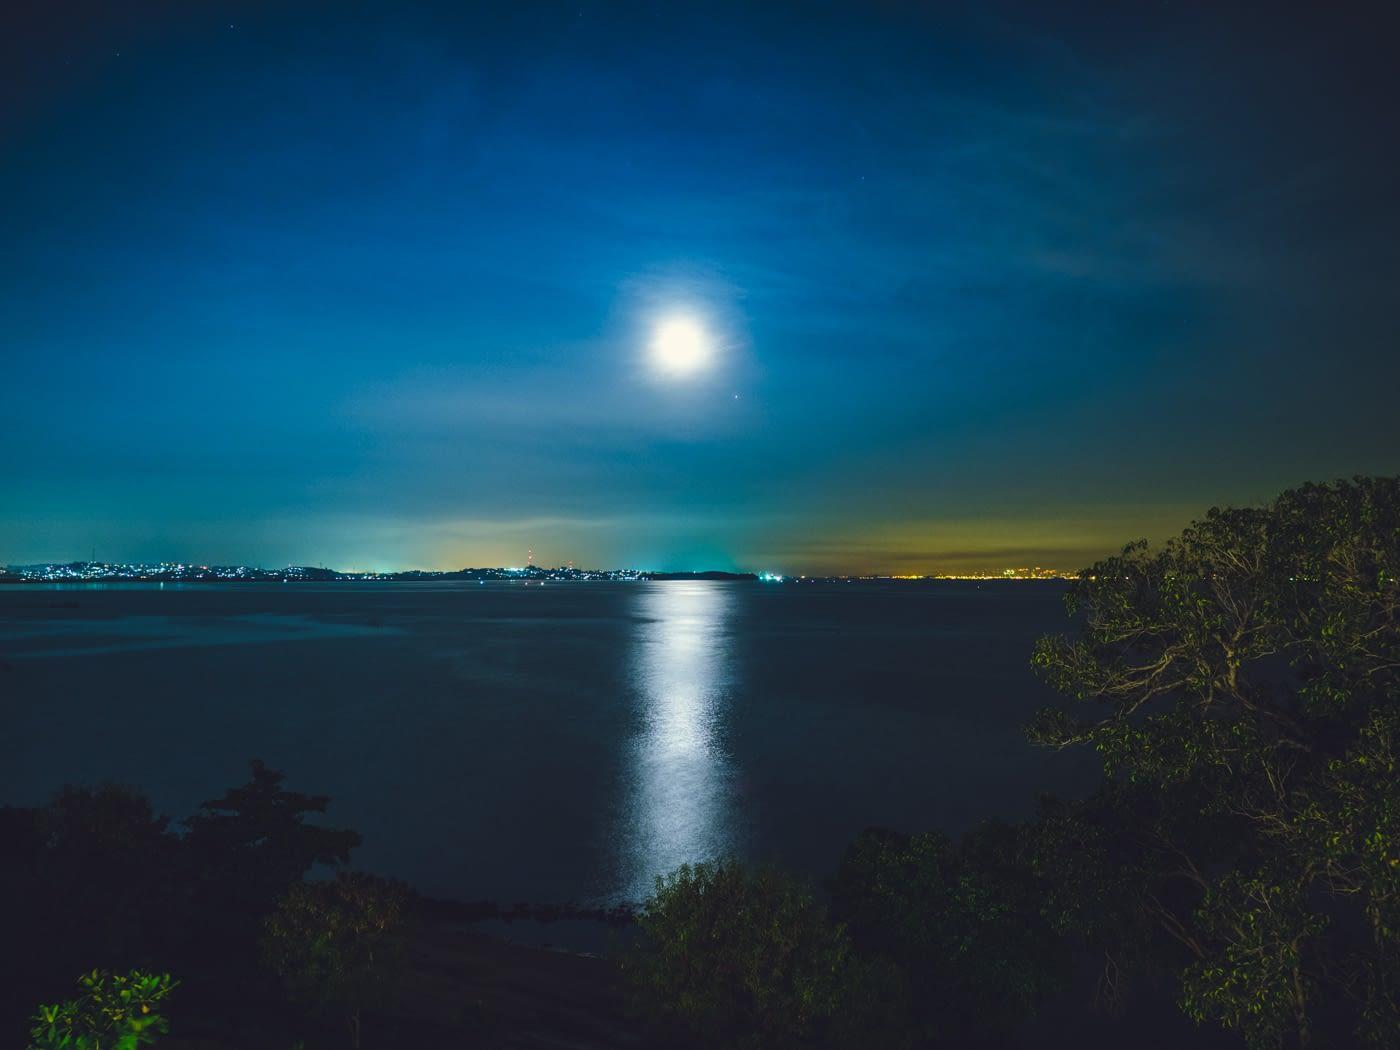 Indonesia - Montigo - Sunset reflecting moon